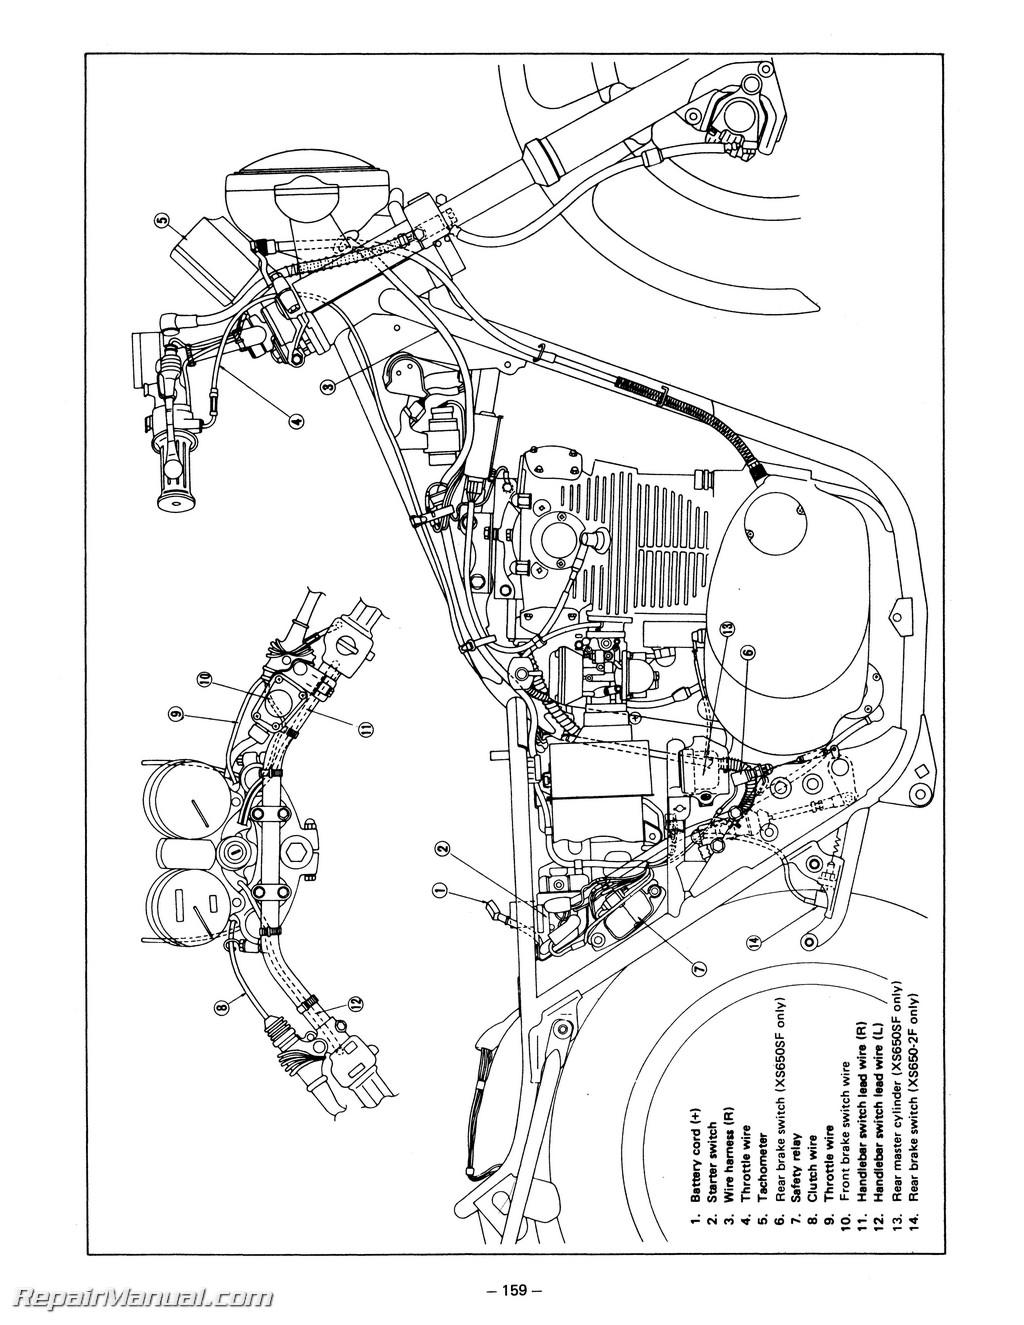 hight resolution of 1983 yamaha x 650 wiring diagram